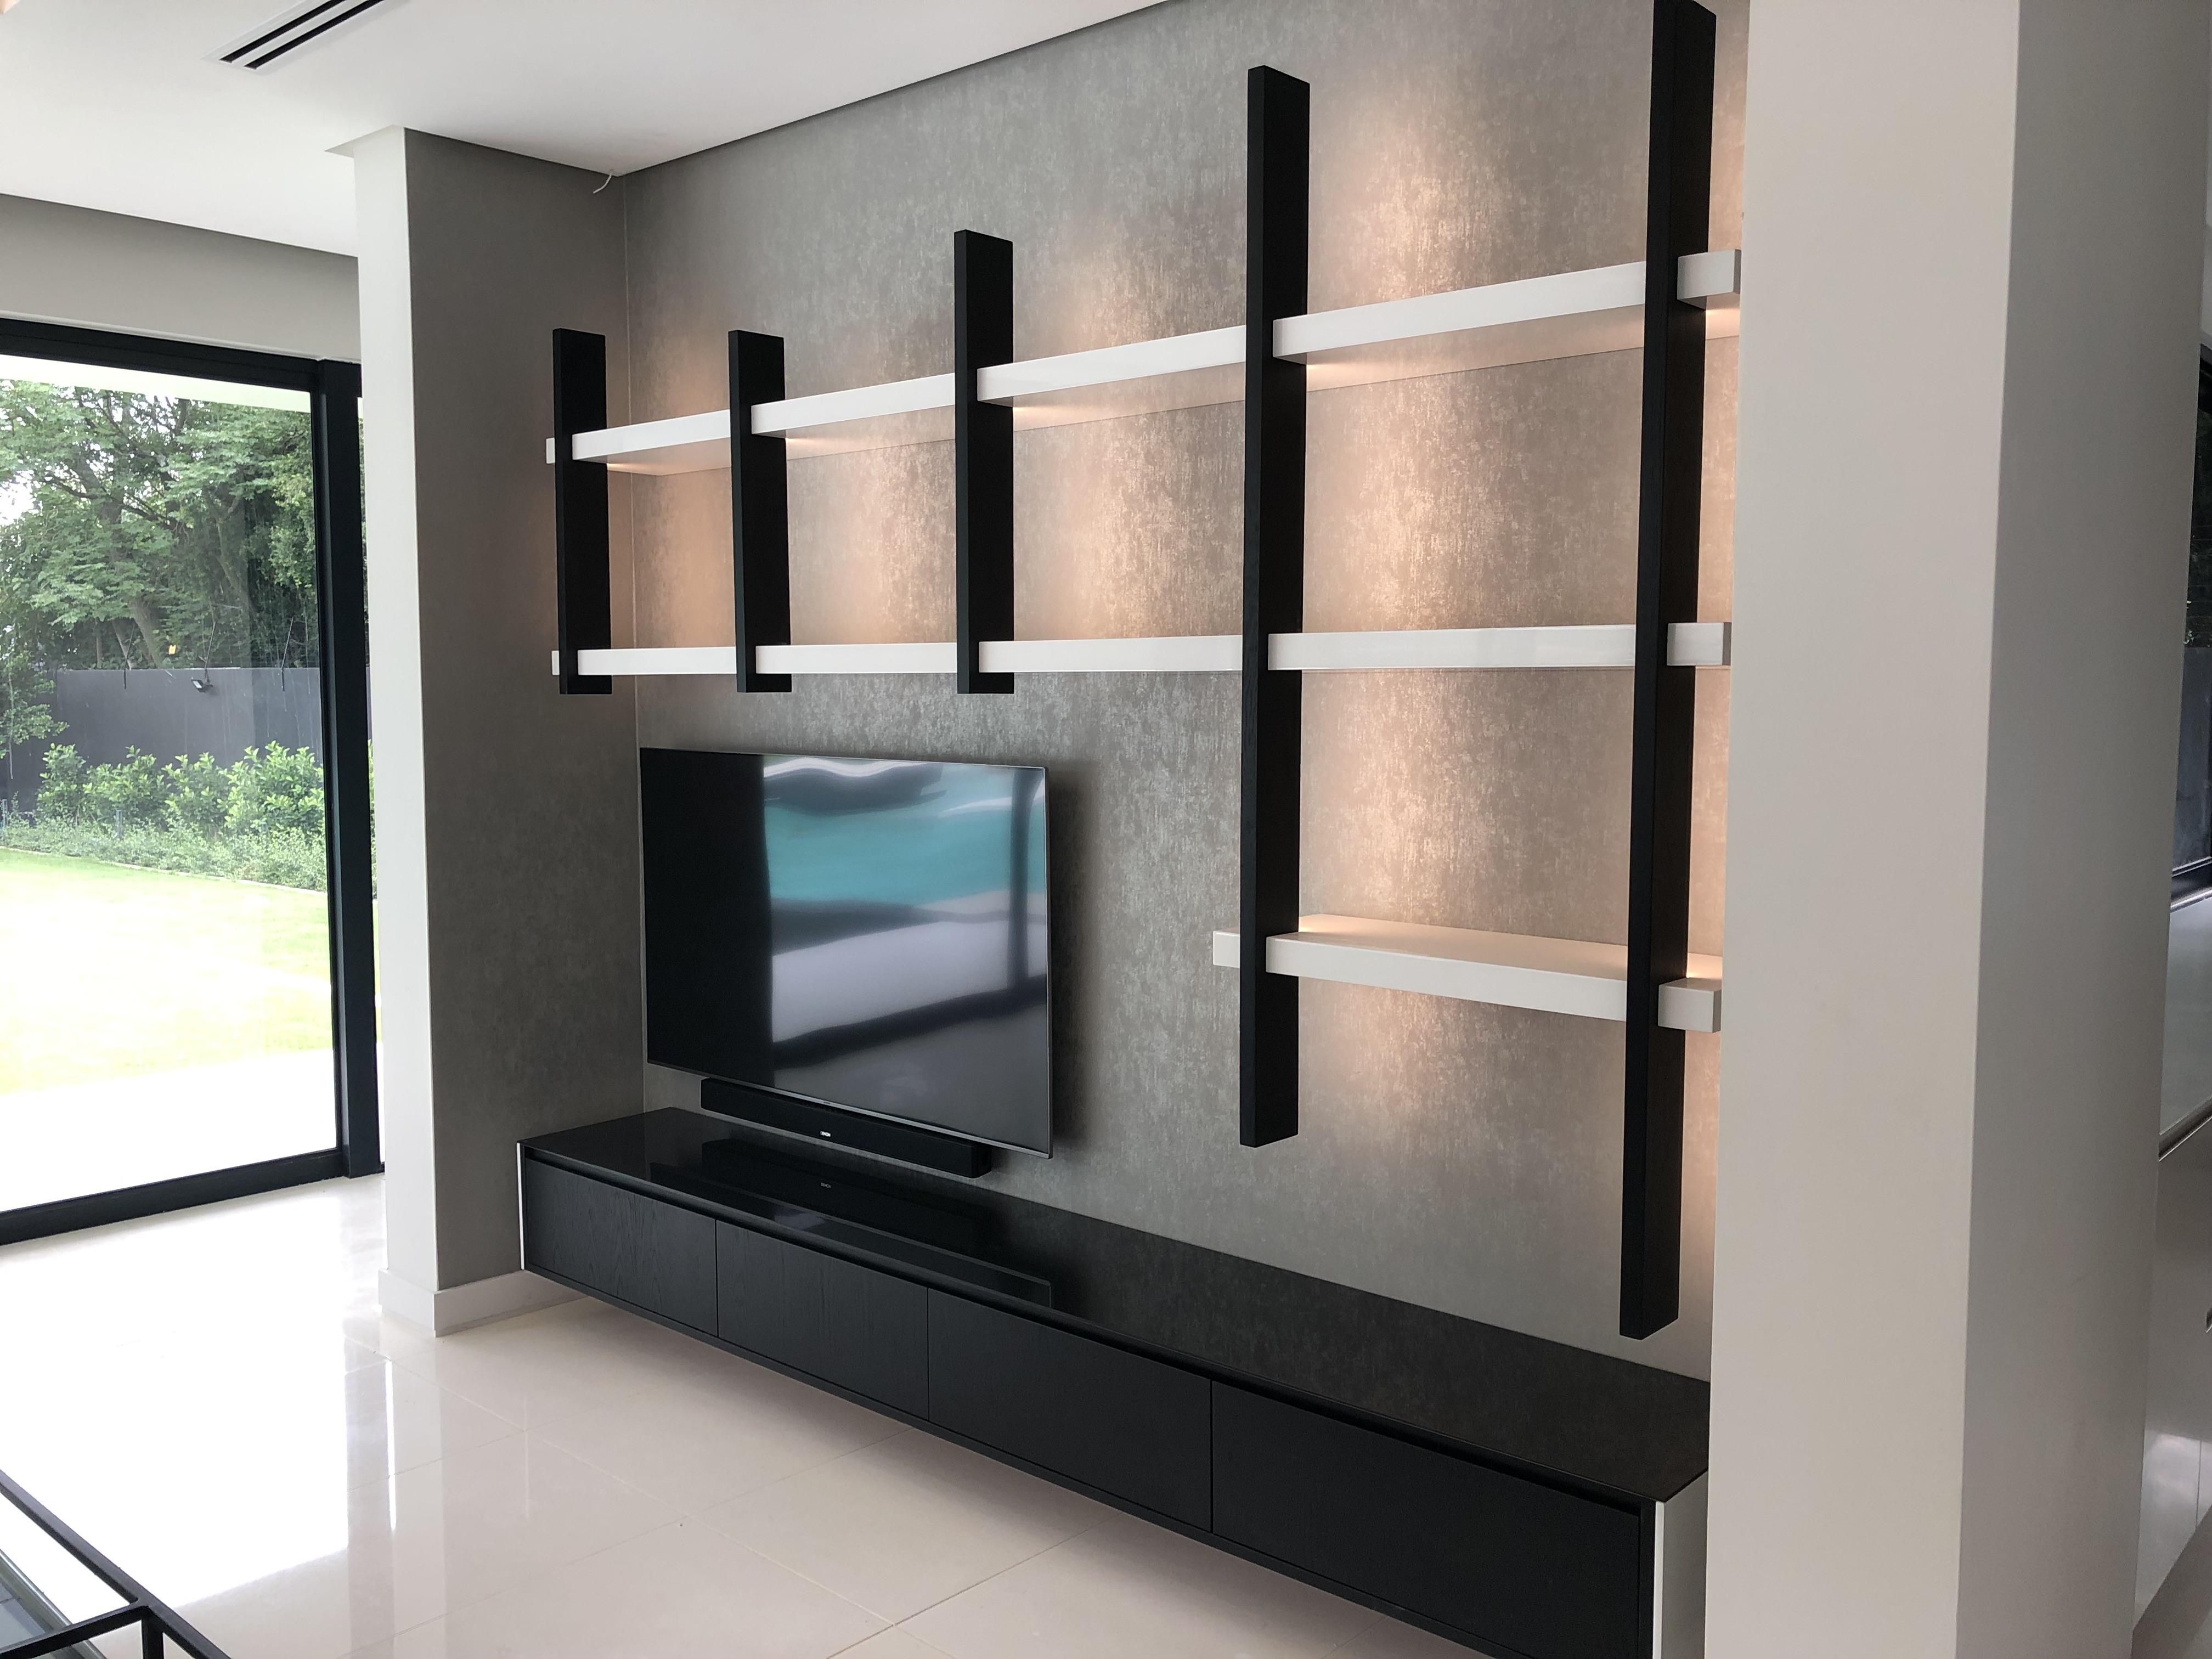 Tv Unit with Backlit Shelving